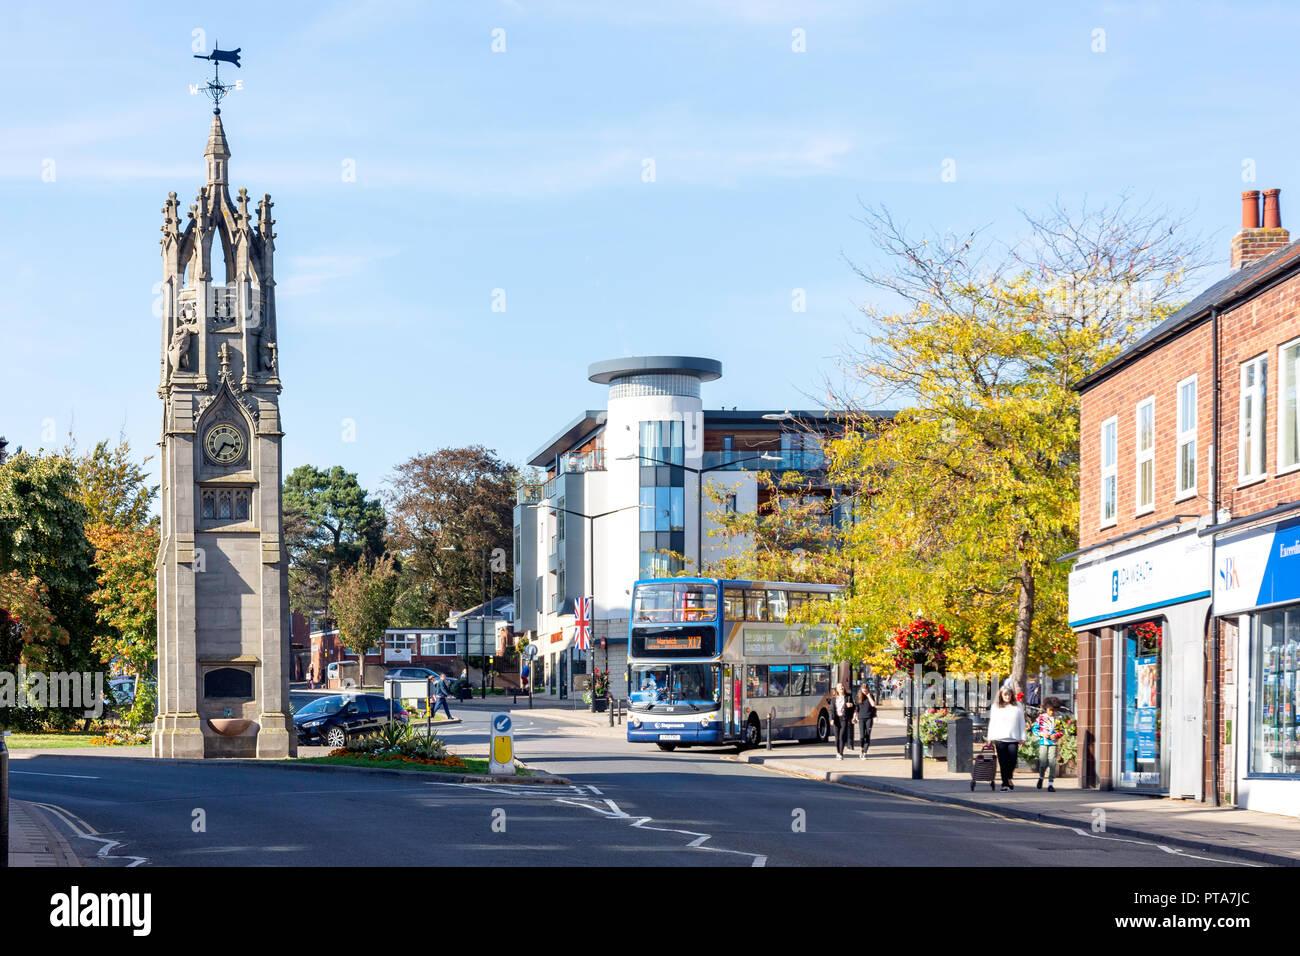 Clock Tower, Abbey End, Kenilworth, Warwickshire, England, United Kingdom - Stock Image